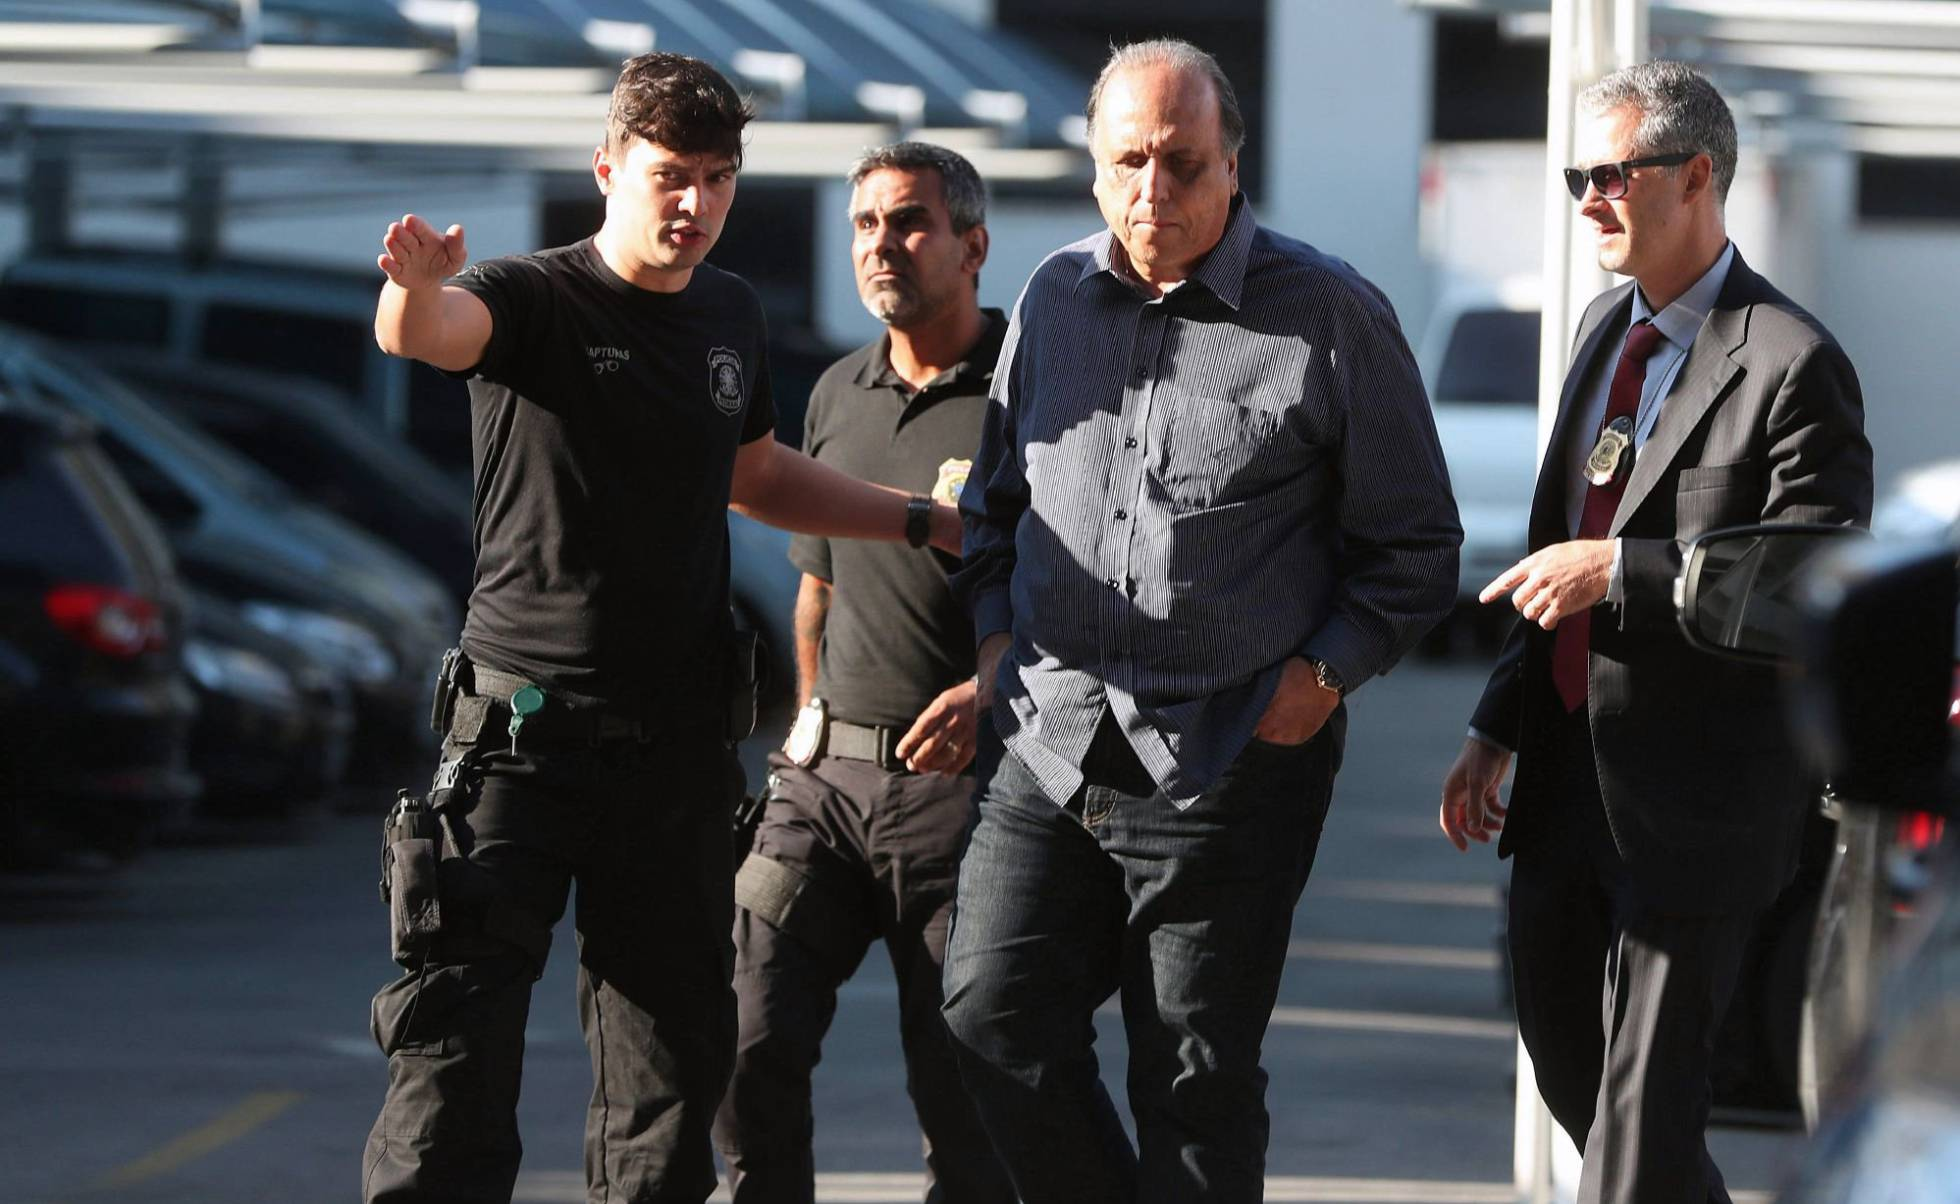 CASO PETROBRAS. Detenido el gobernador de Río de Janeiro dentro del 'caso Petrobras'